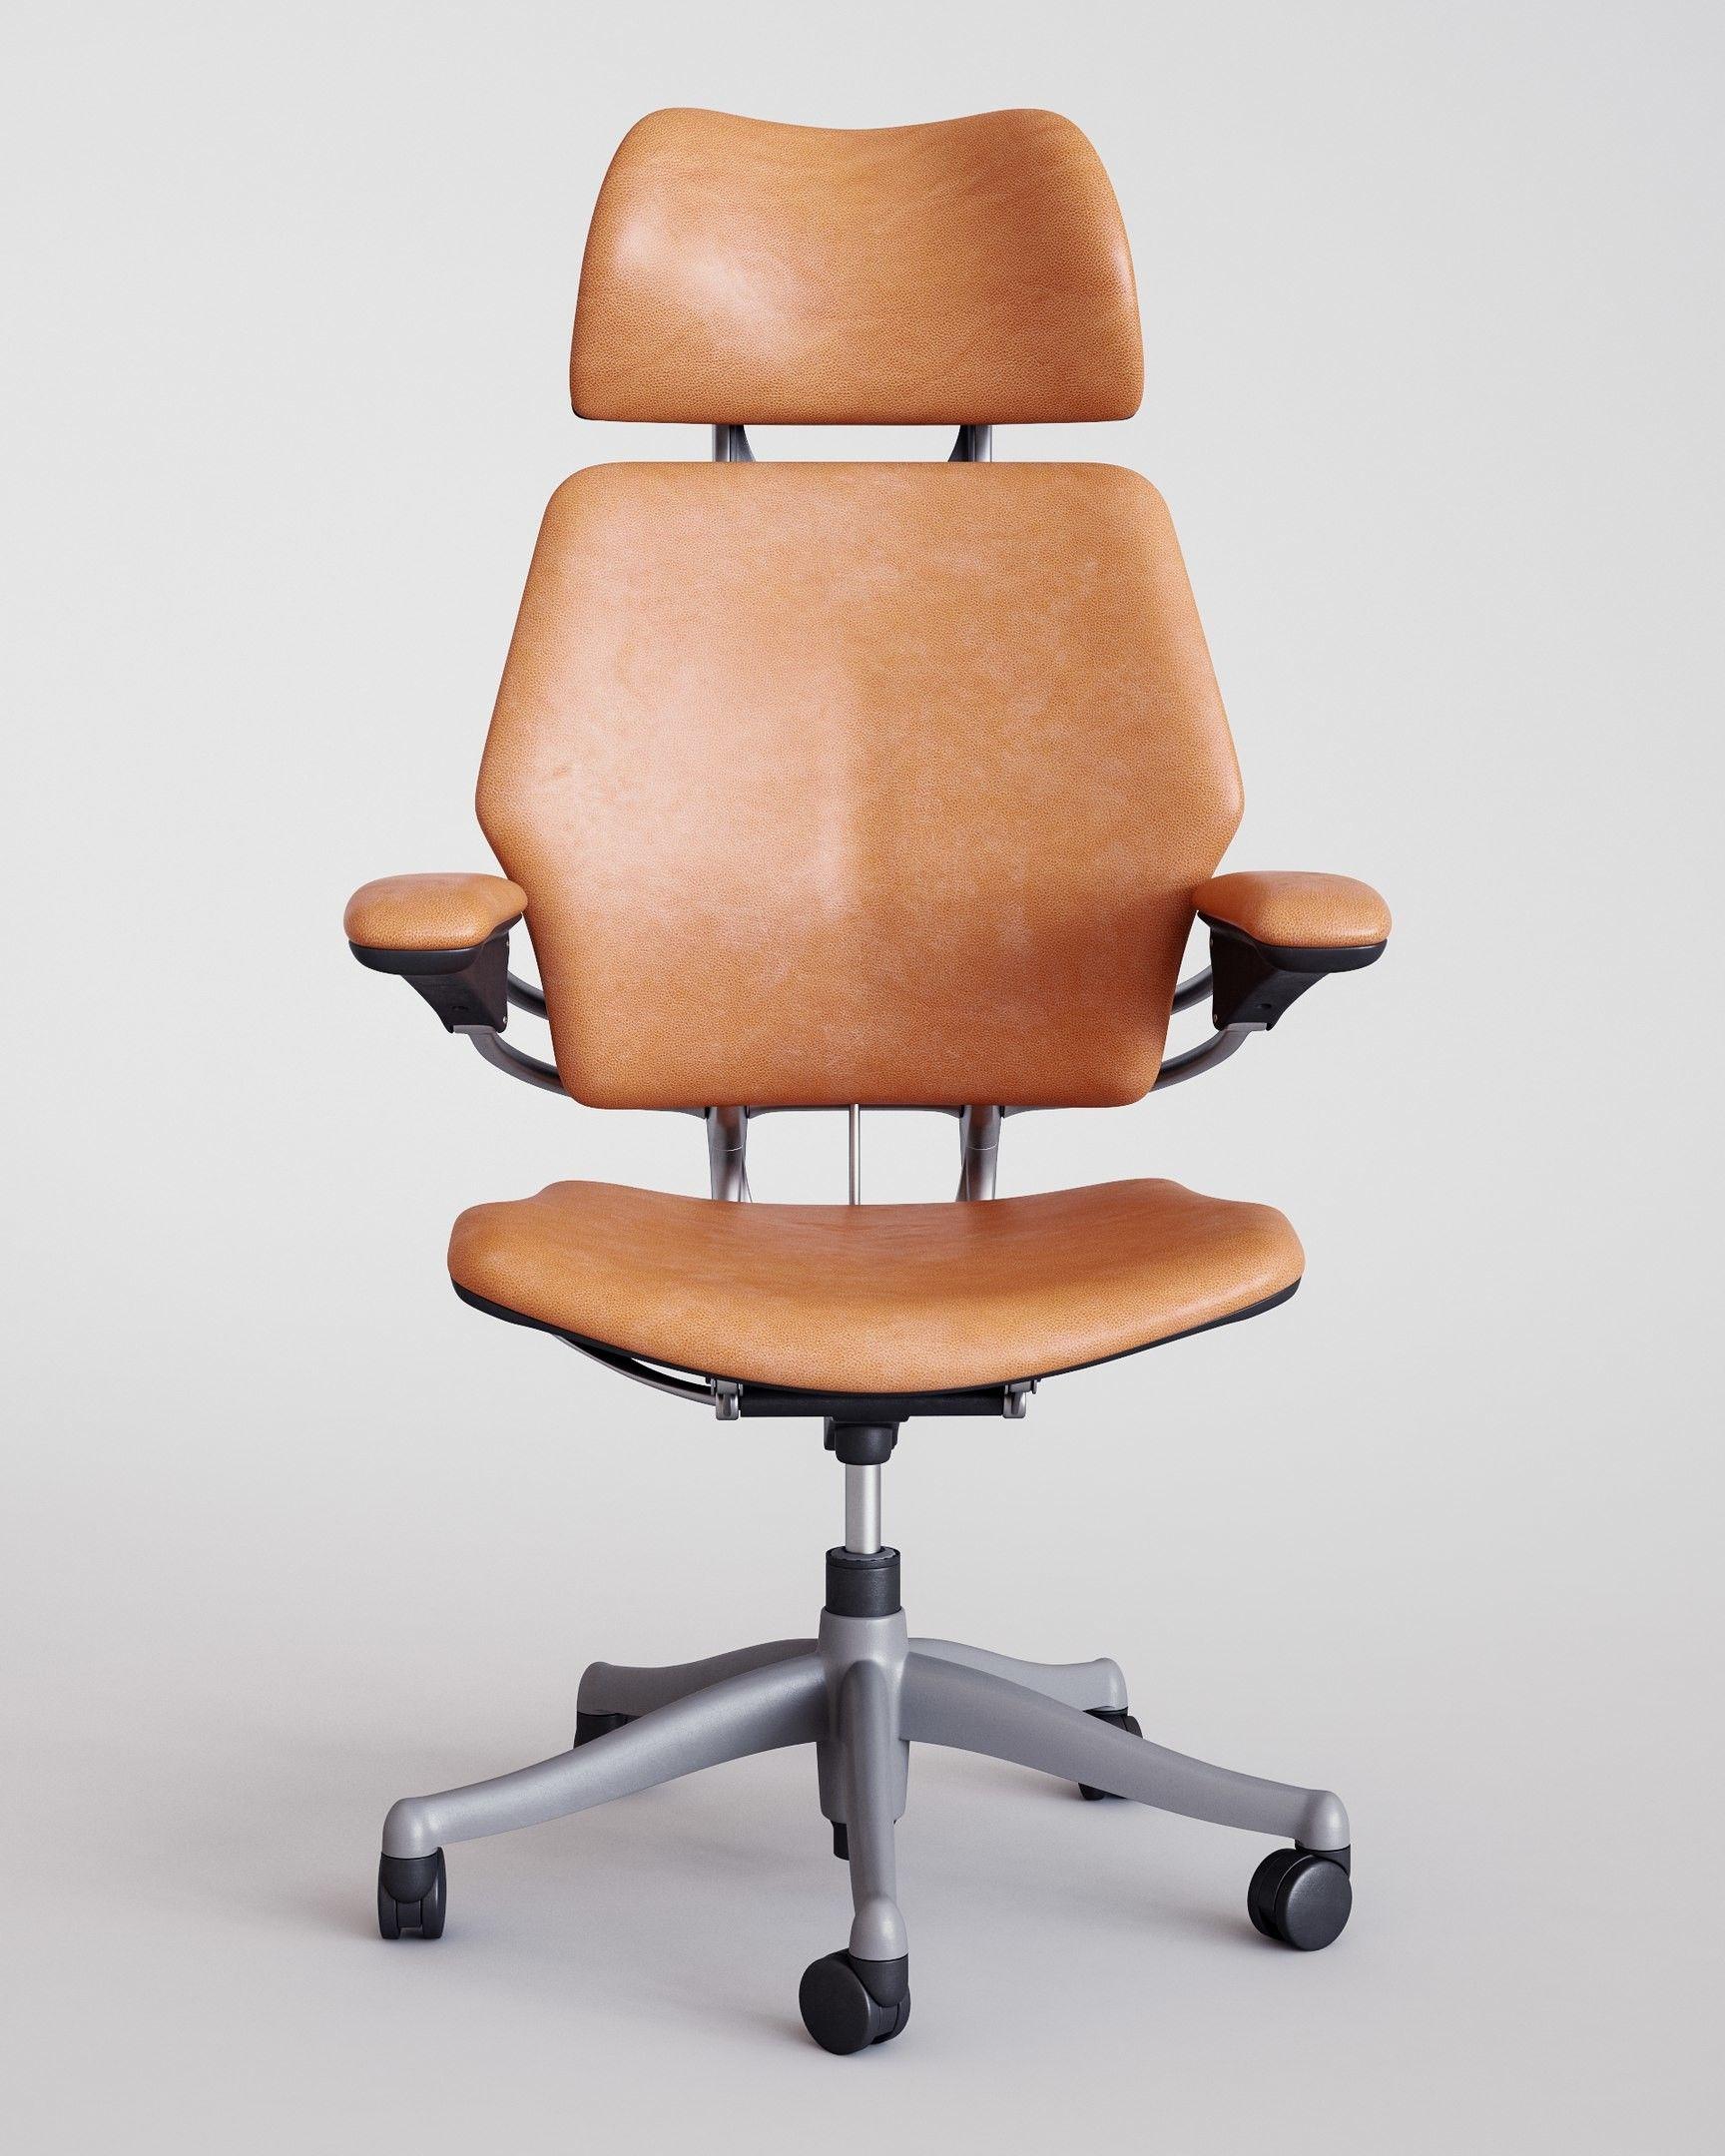 Artstation Humanscale Freedom Chair Andrew Chmir Chair